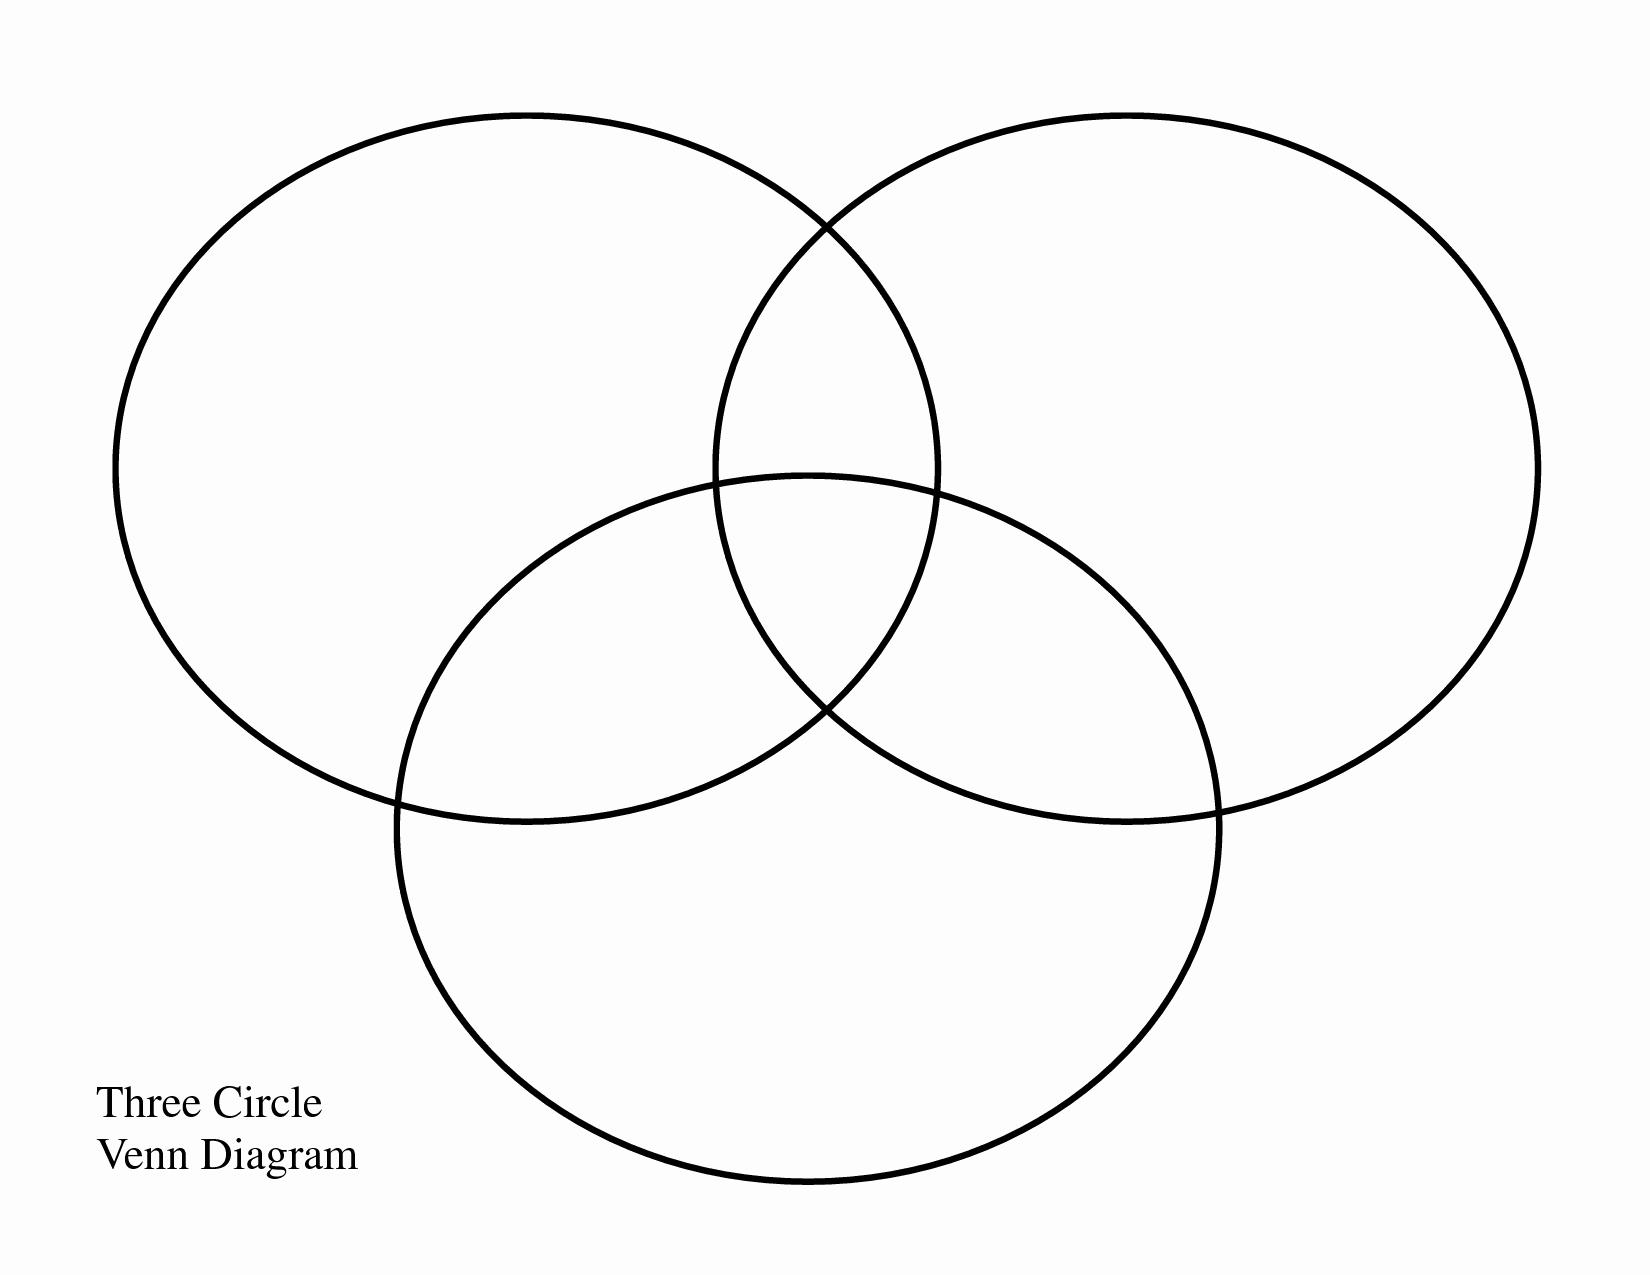 Venn Diagram Template Editable Elegant Diagram Template Category Page 1 Efoza